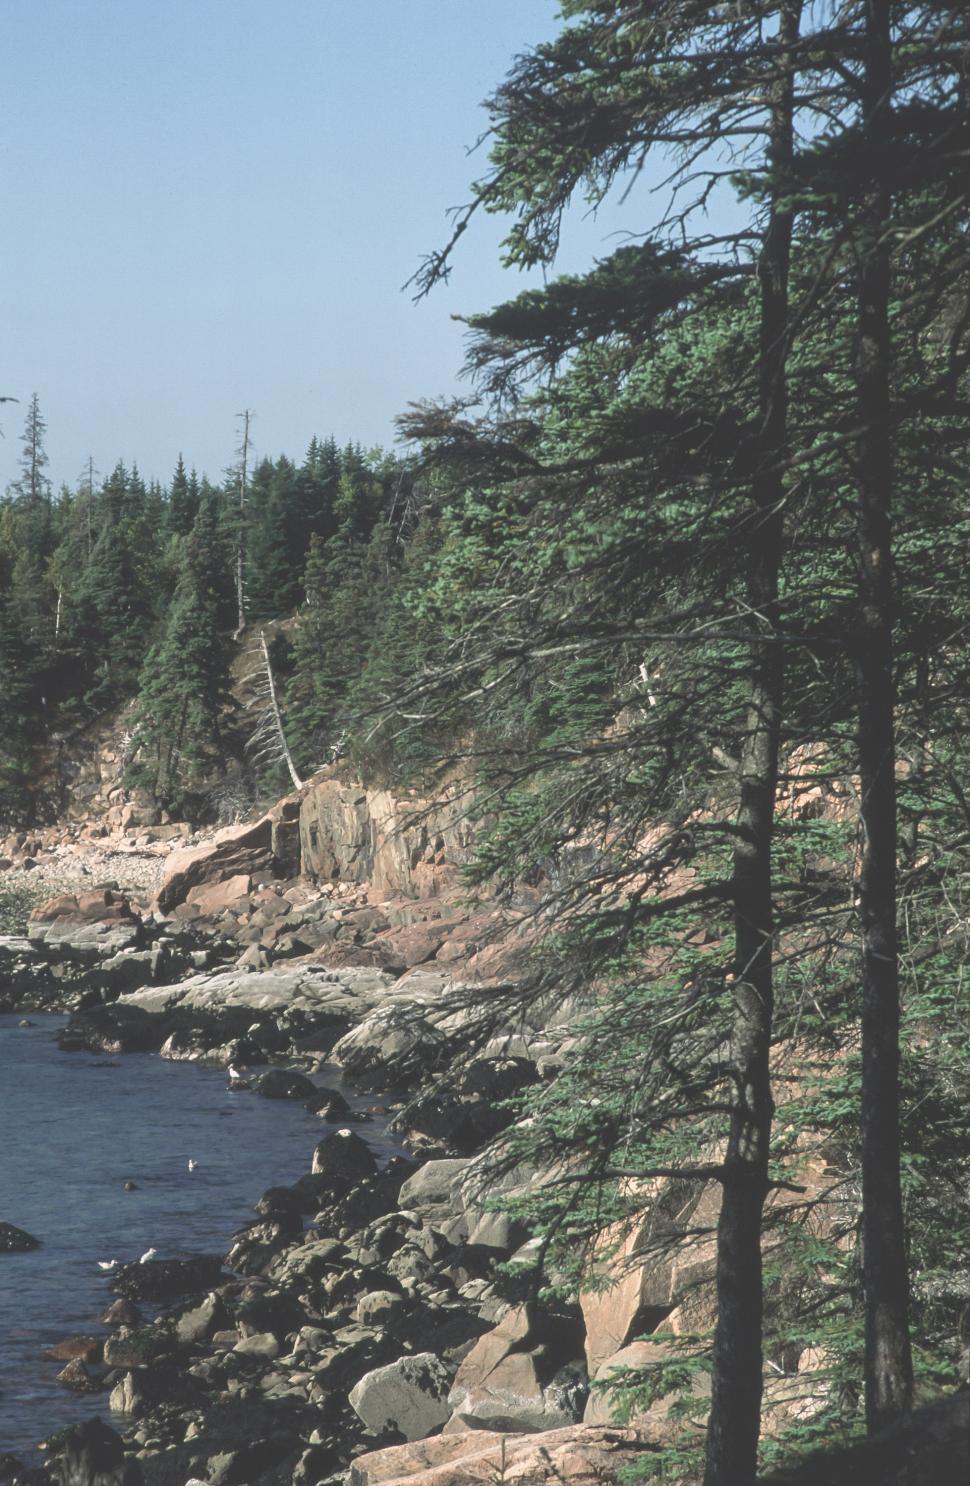 Download Free Stock HD Photo of Eagle Lake Rocky Shoreline Online